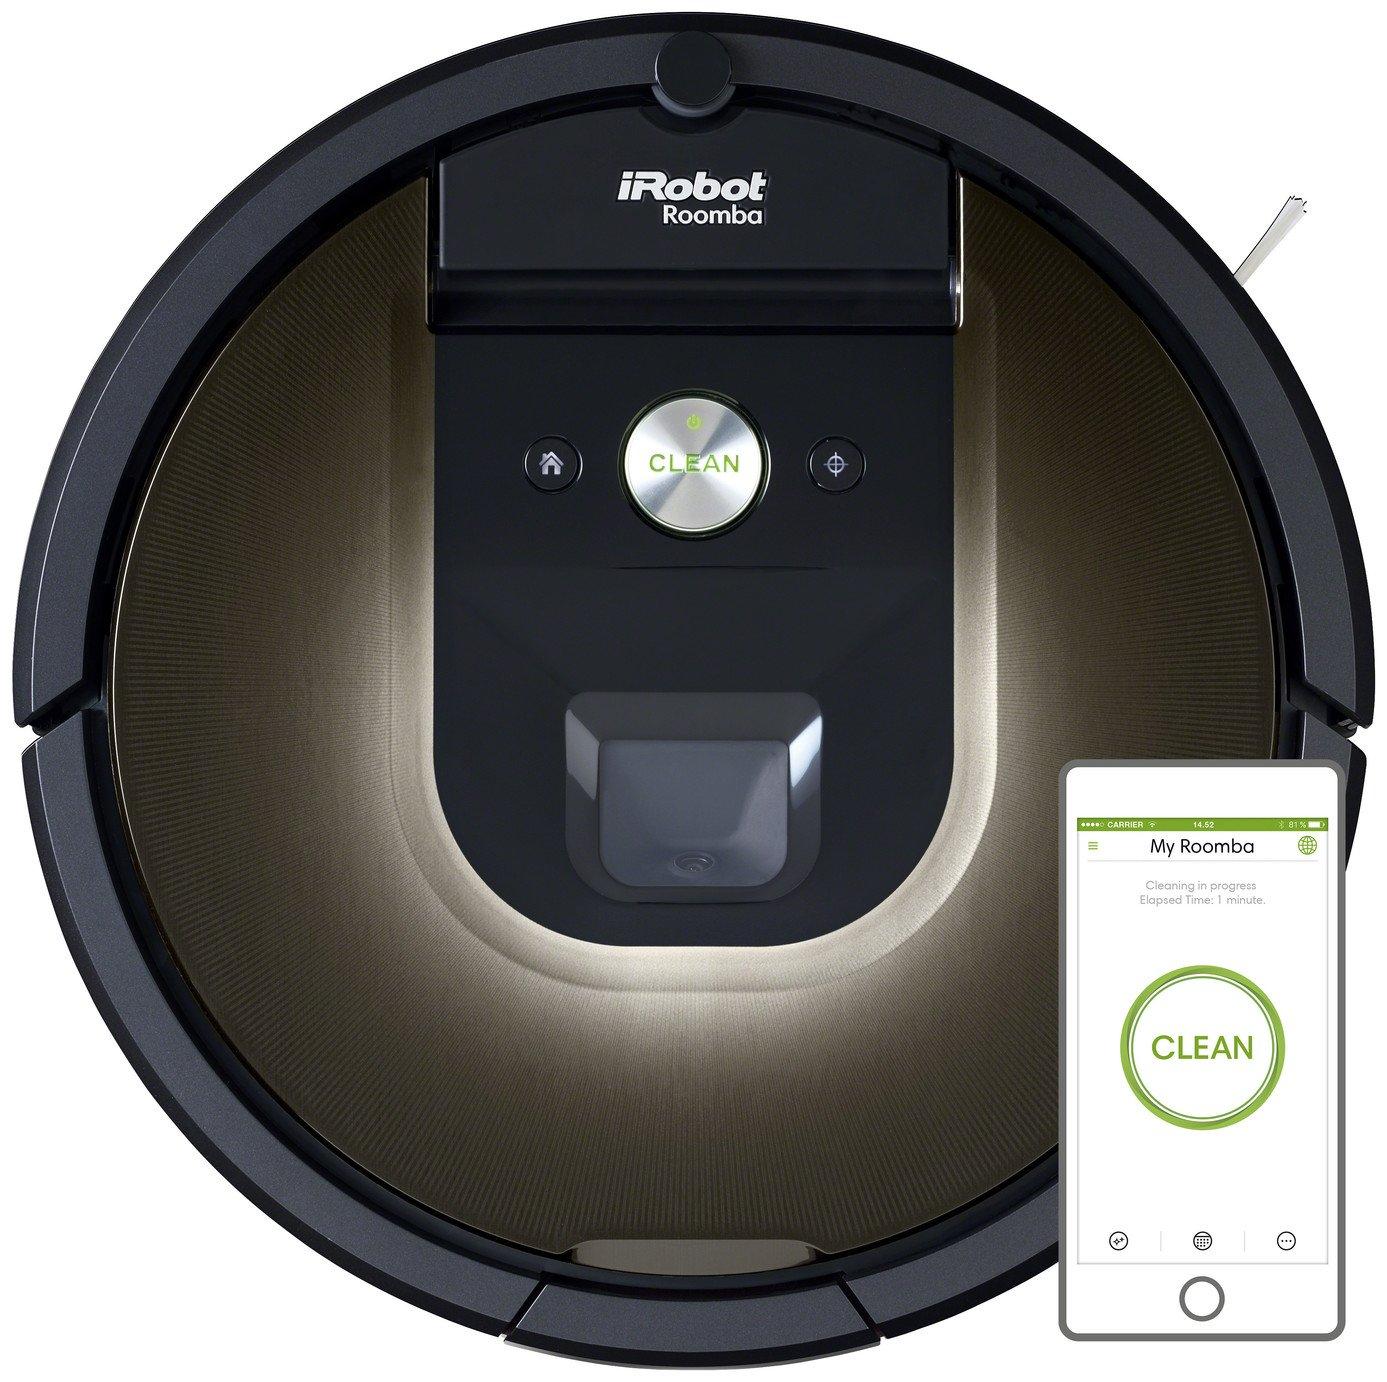 iRobot 980 Roomba Robot Vacuum Cleaner